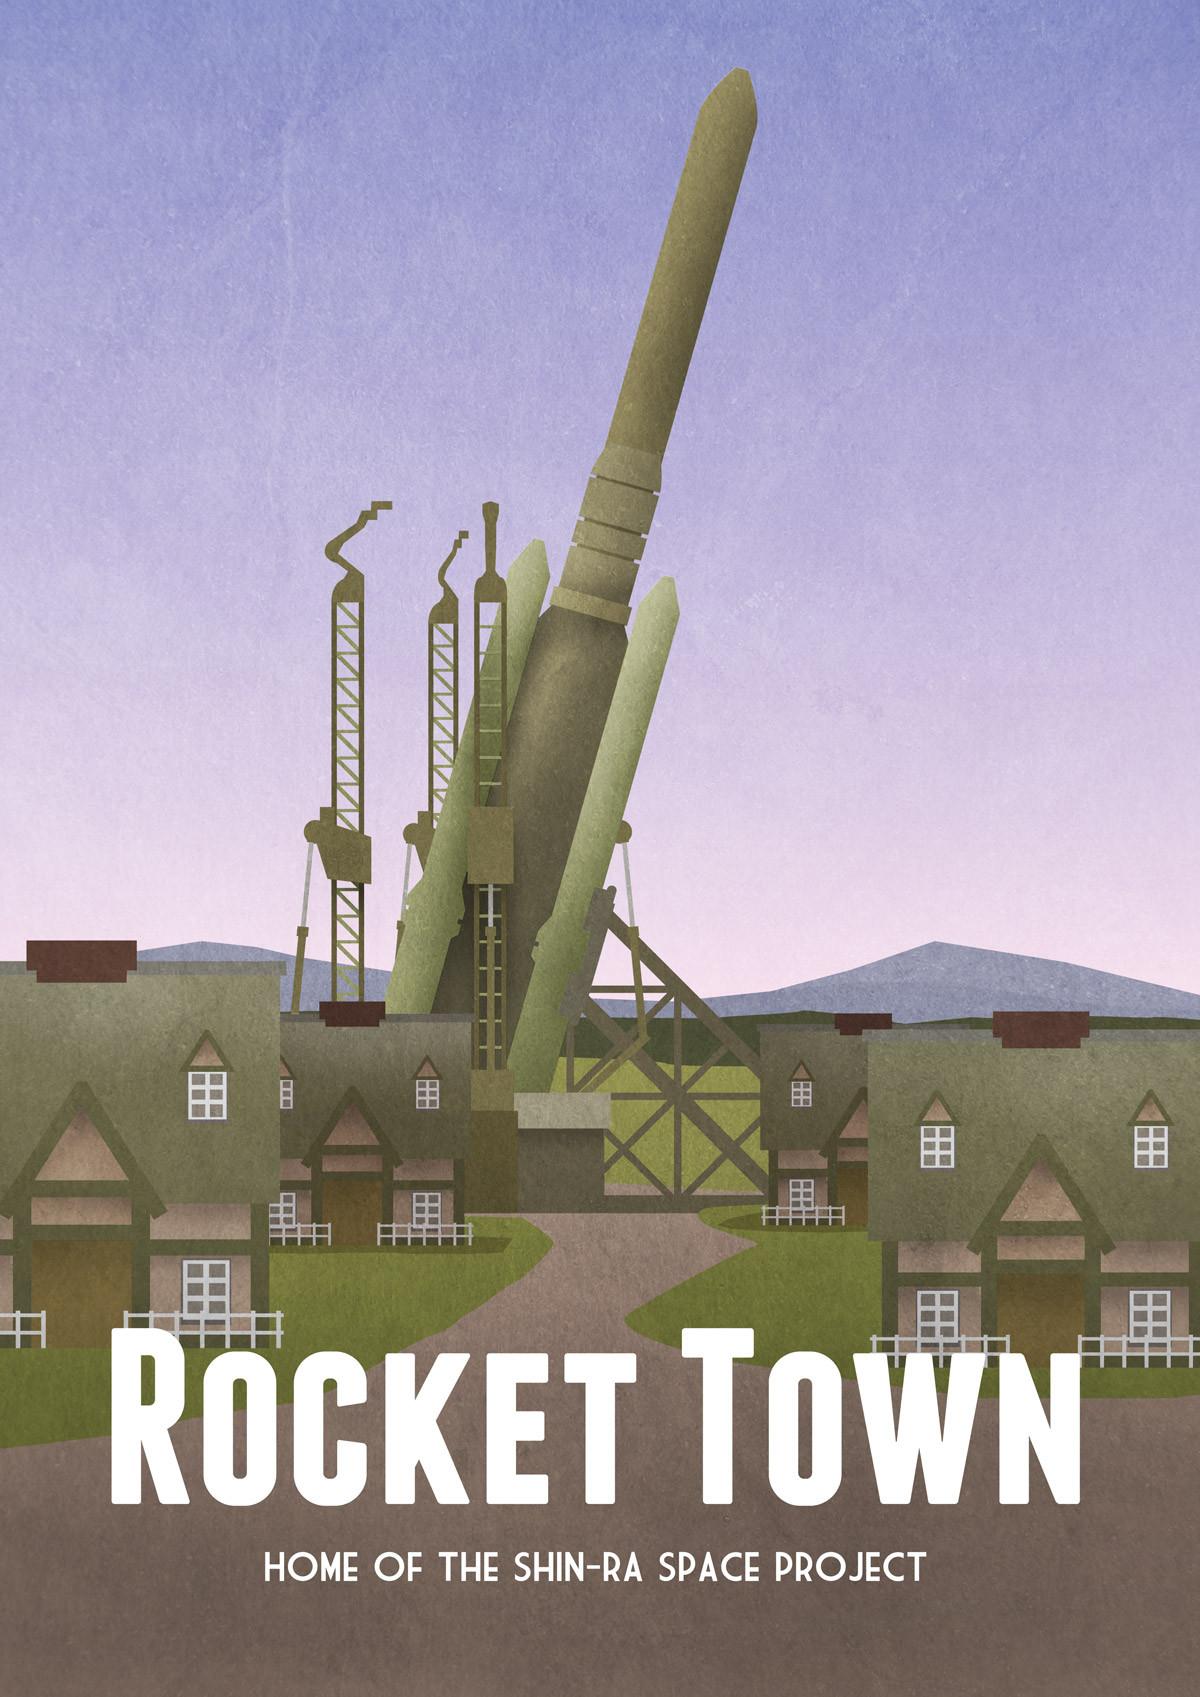 rocket-town-final-fantasy-vii-travel-poster_1